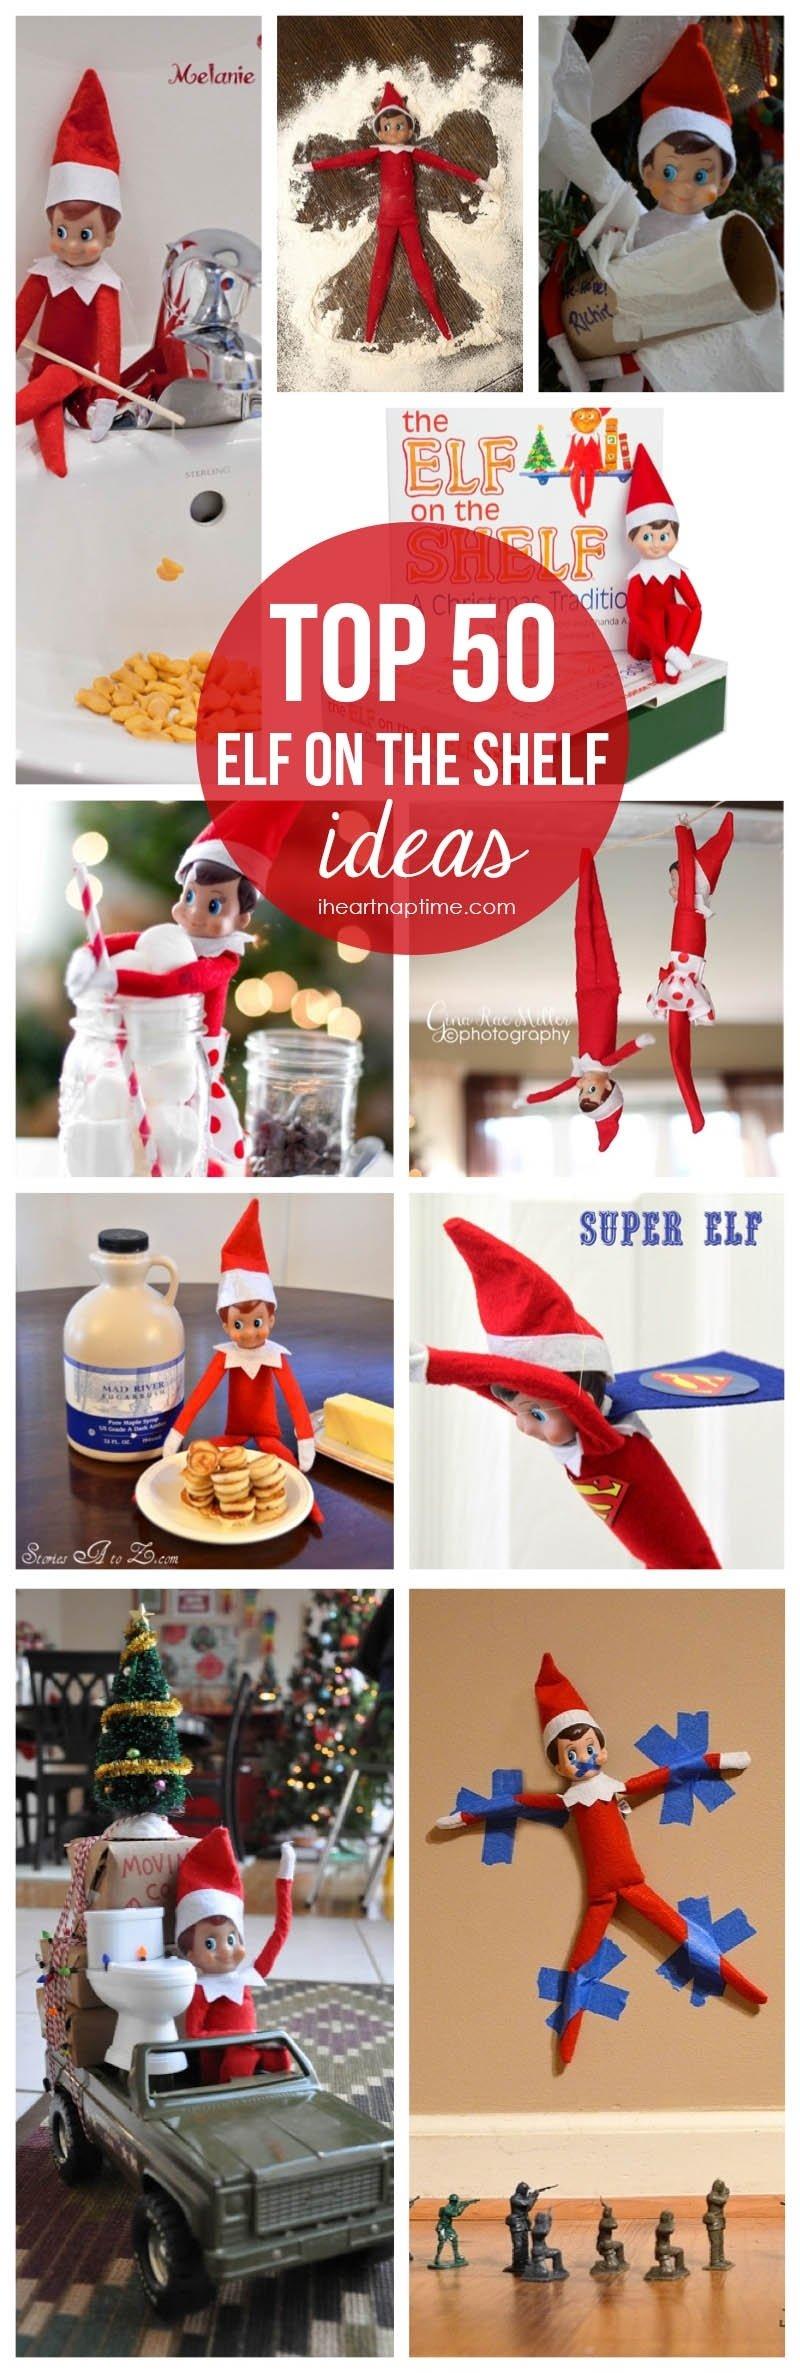 10 Cute Cool Ideas For Elf On The Shelf top 50 elf on the shelf ideas i heart nap time 5 2020